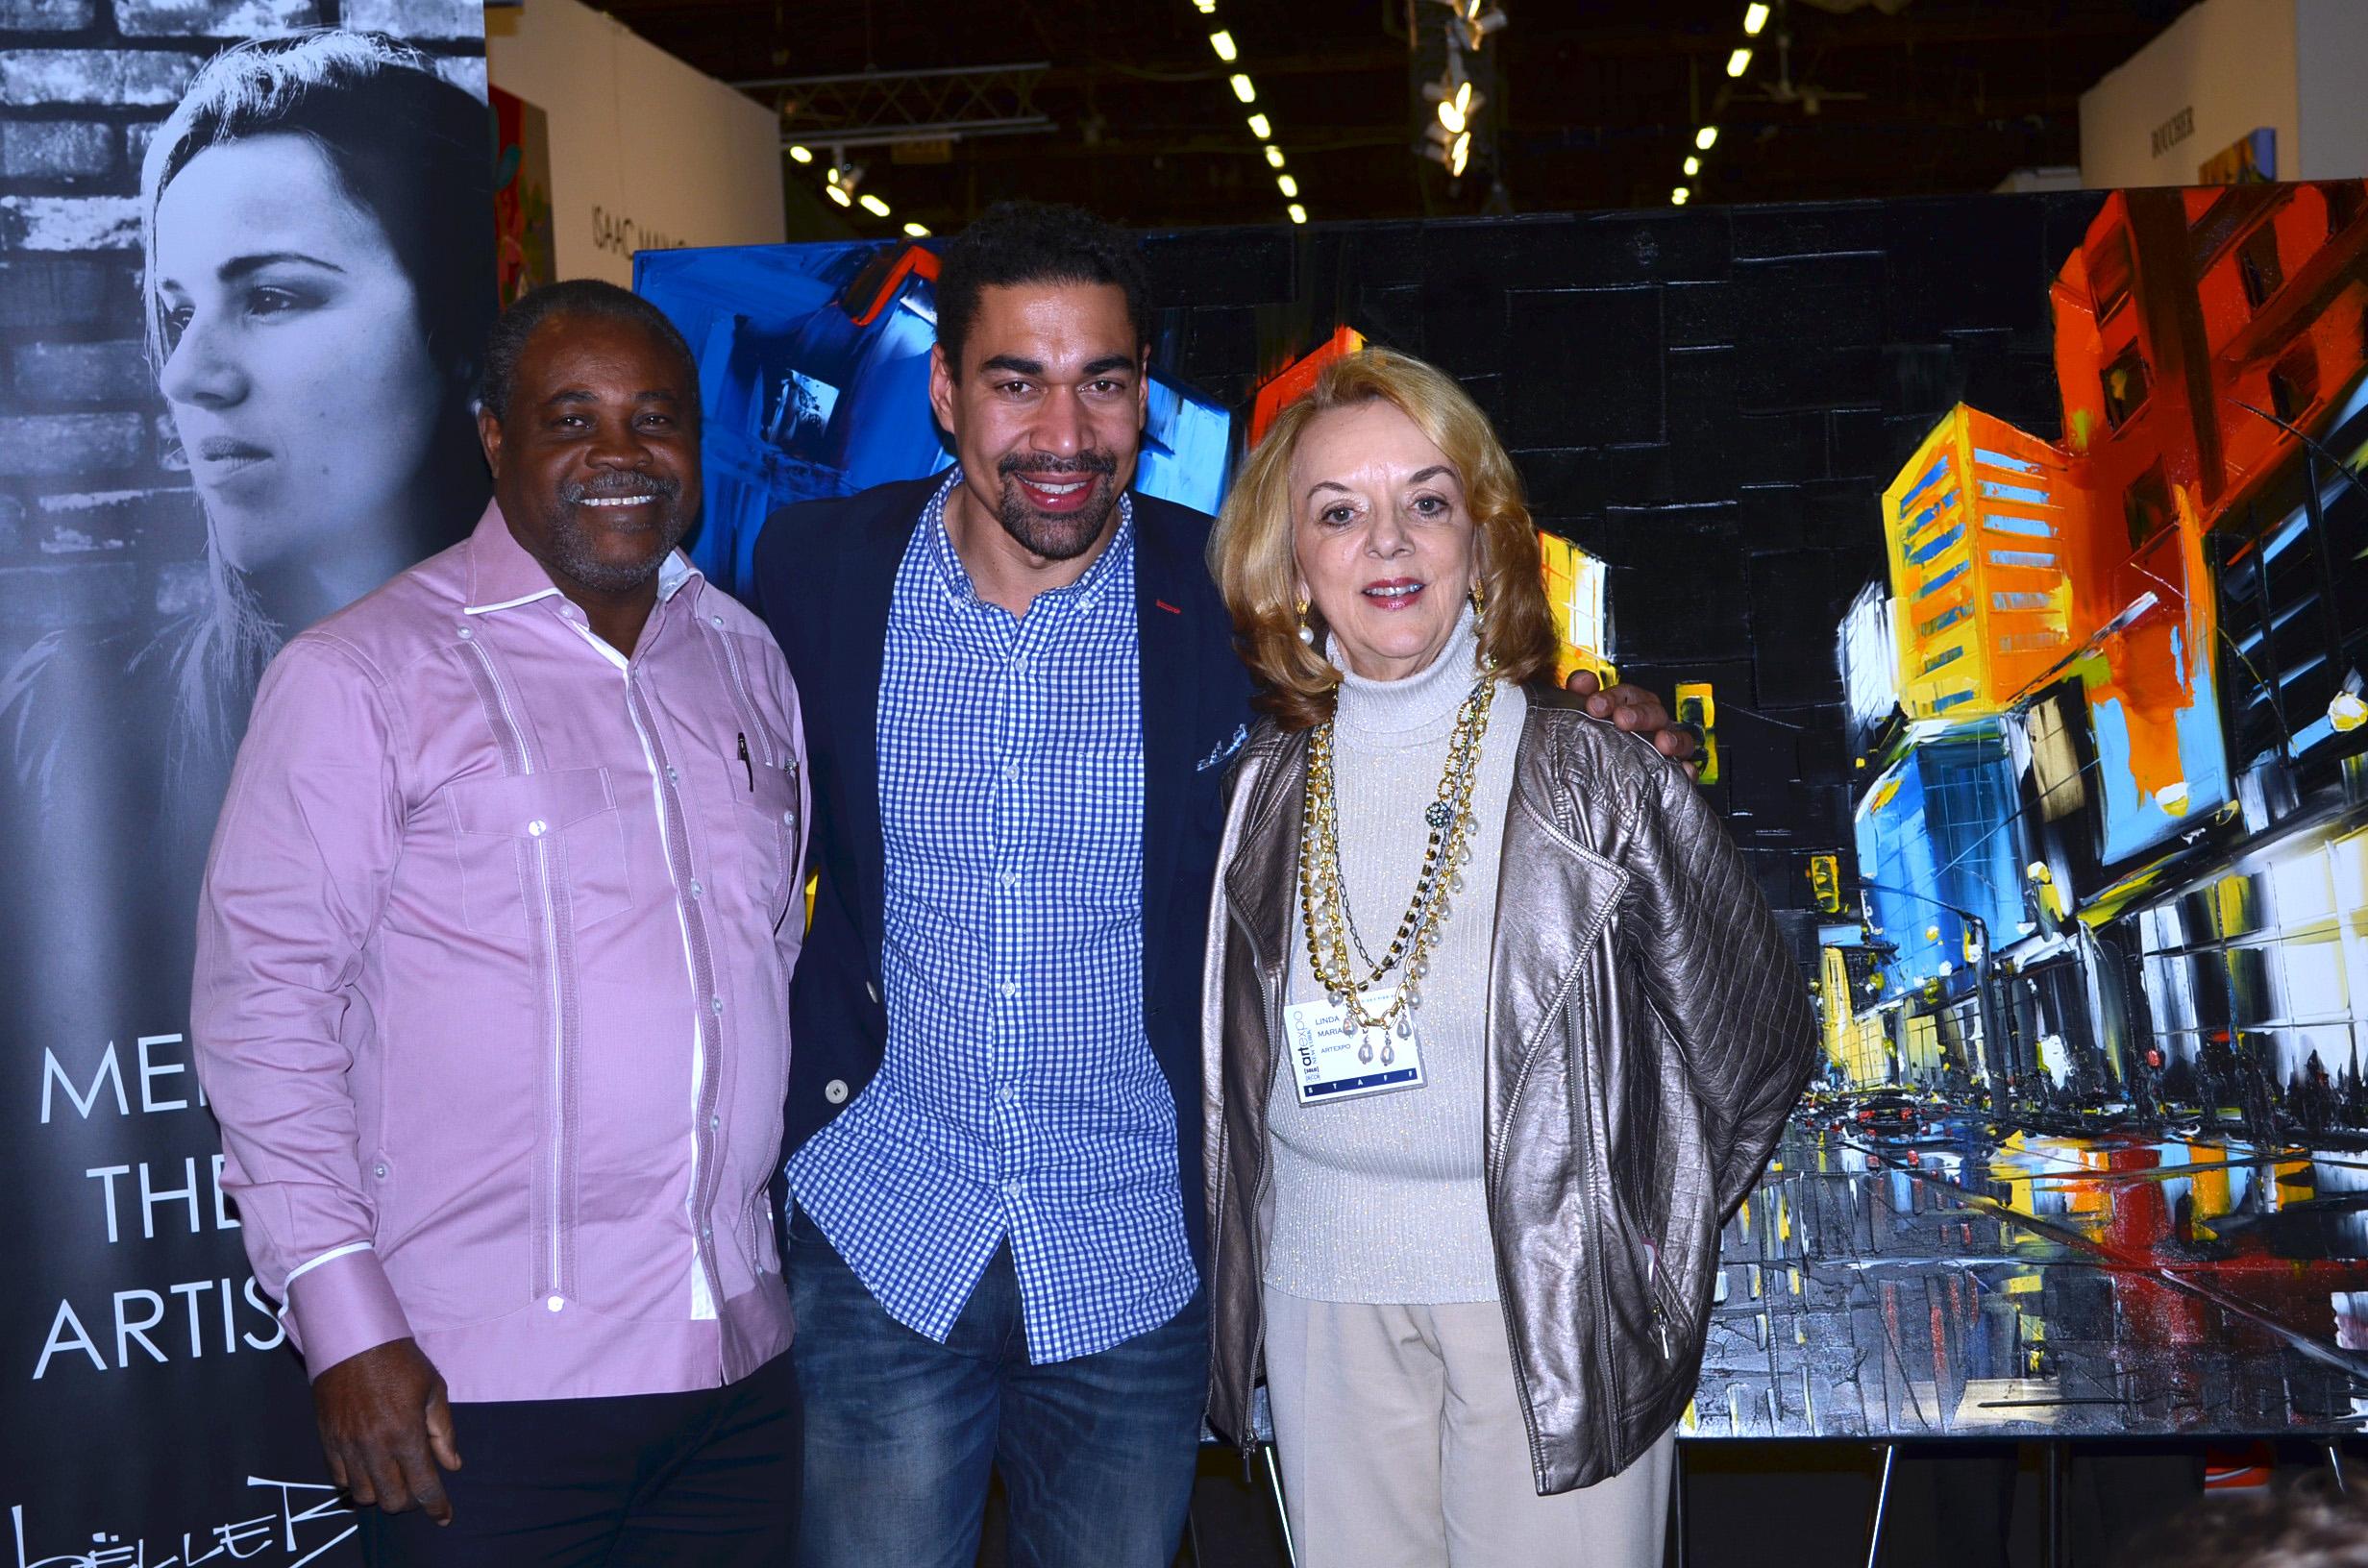 DESTACADA PARTICIPACION DE  ARTISTAS PLASTICOS DOMINICANOS EN ARTEXPO 2015